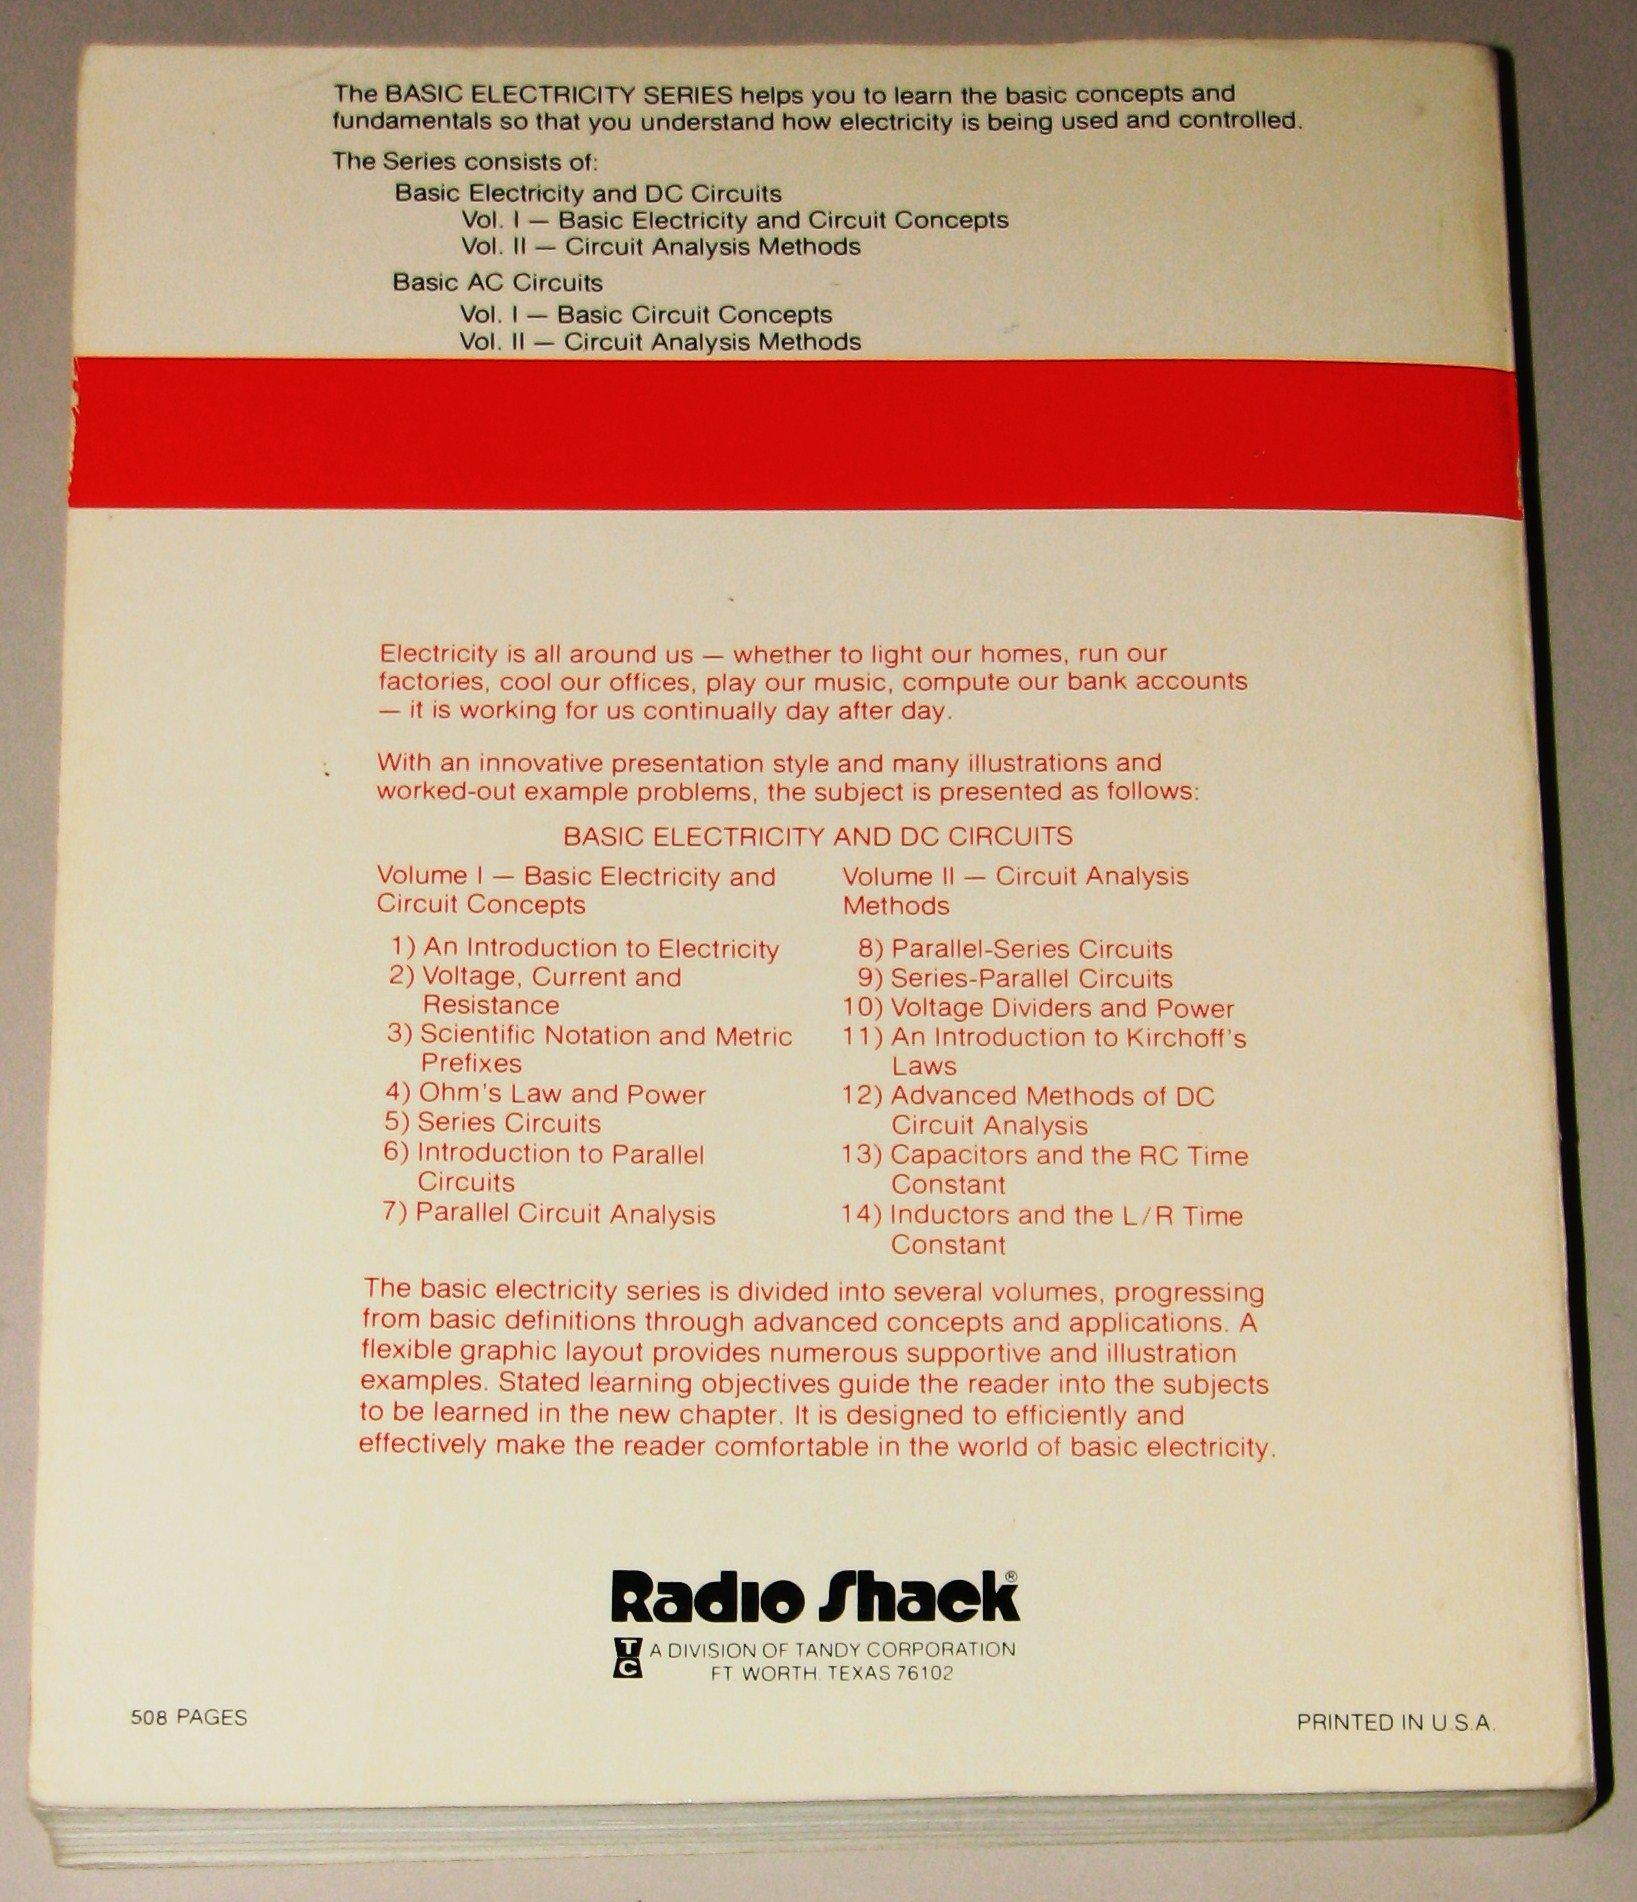 Dc Circuits Vol Ii Circuit Analysis Methods Ralpha Oliva Amazon Circuitforcircuitconceptspage2jpg Books